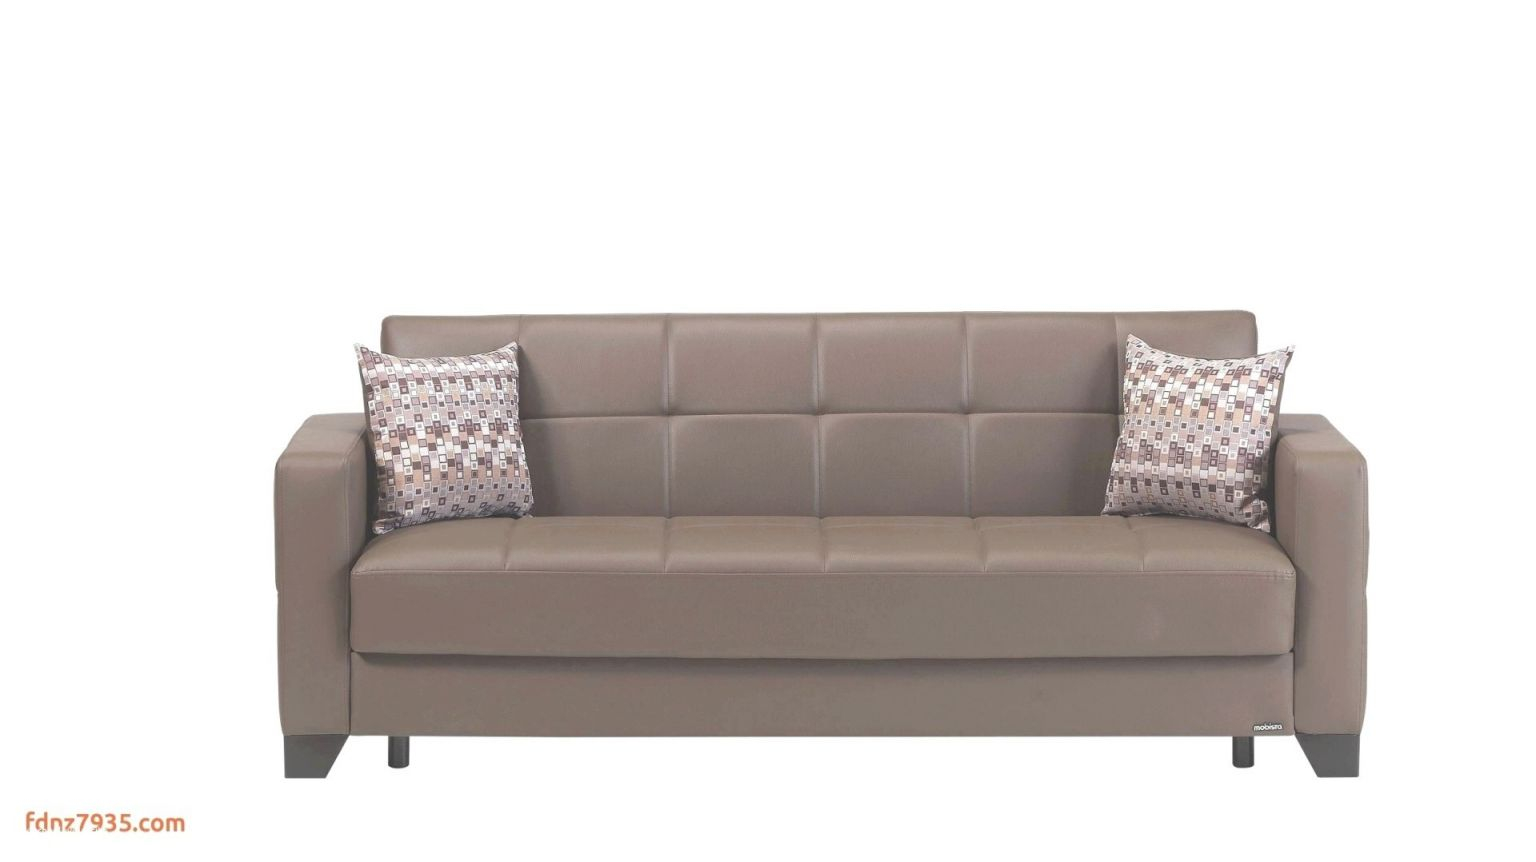 Sleeper Kids World – Use663.xyz pertaining to Lovely Raymour And Flanigan Sleeper Sofa